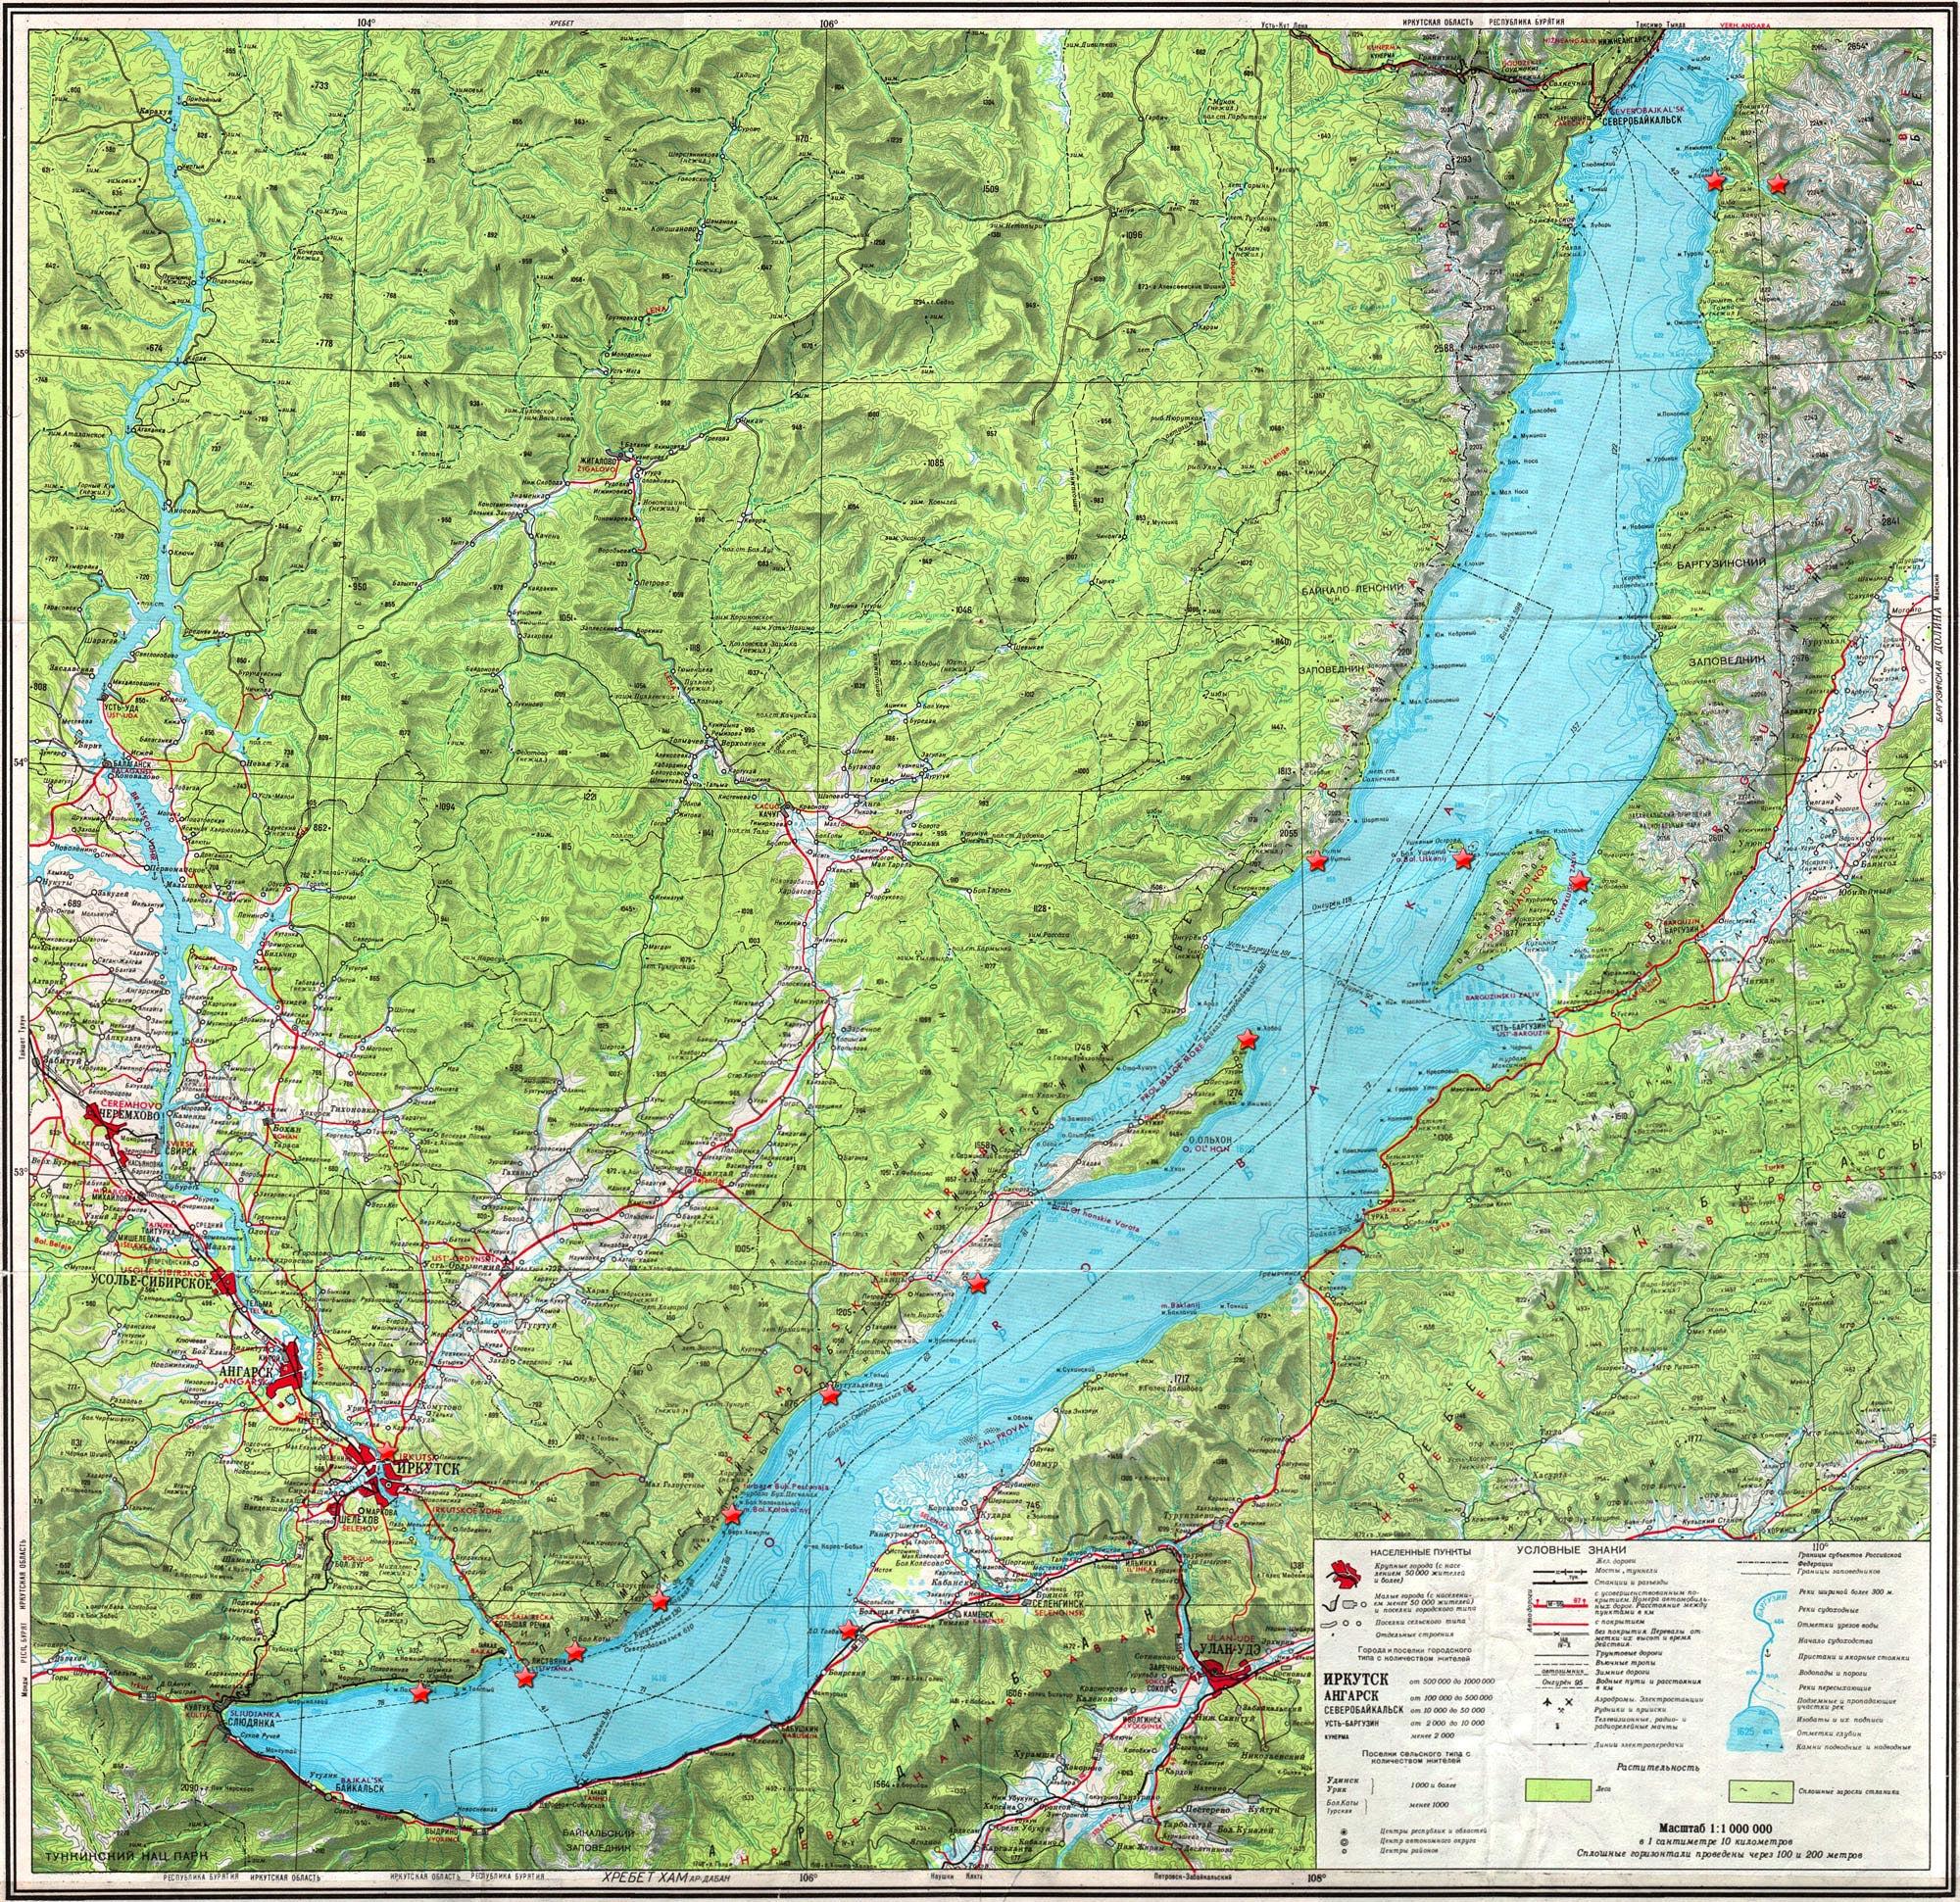 Baikal Explorer - Map of lake Baikal